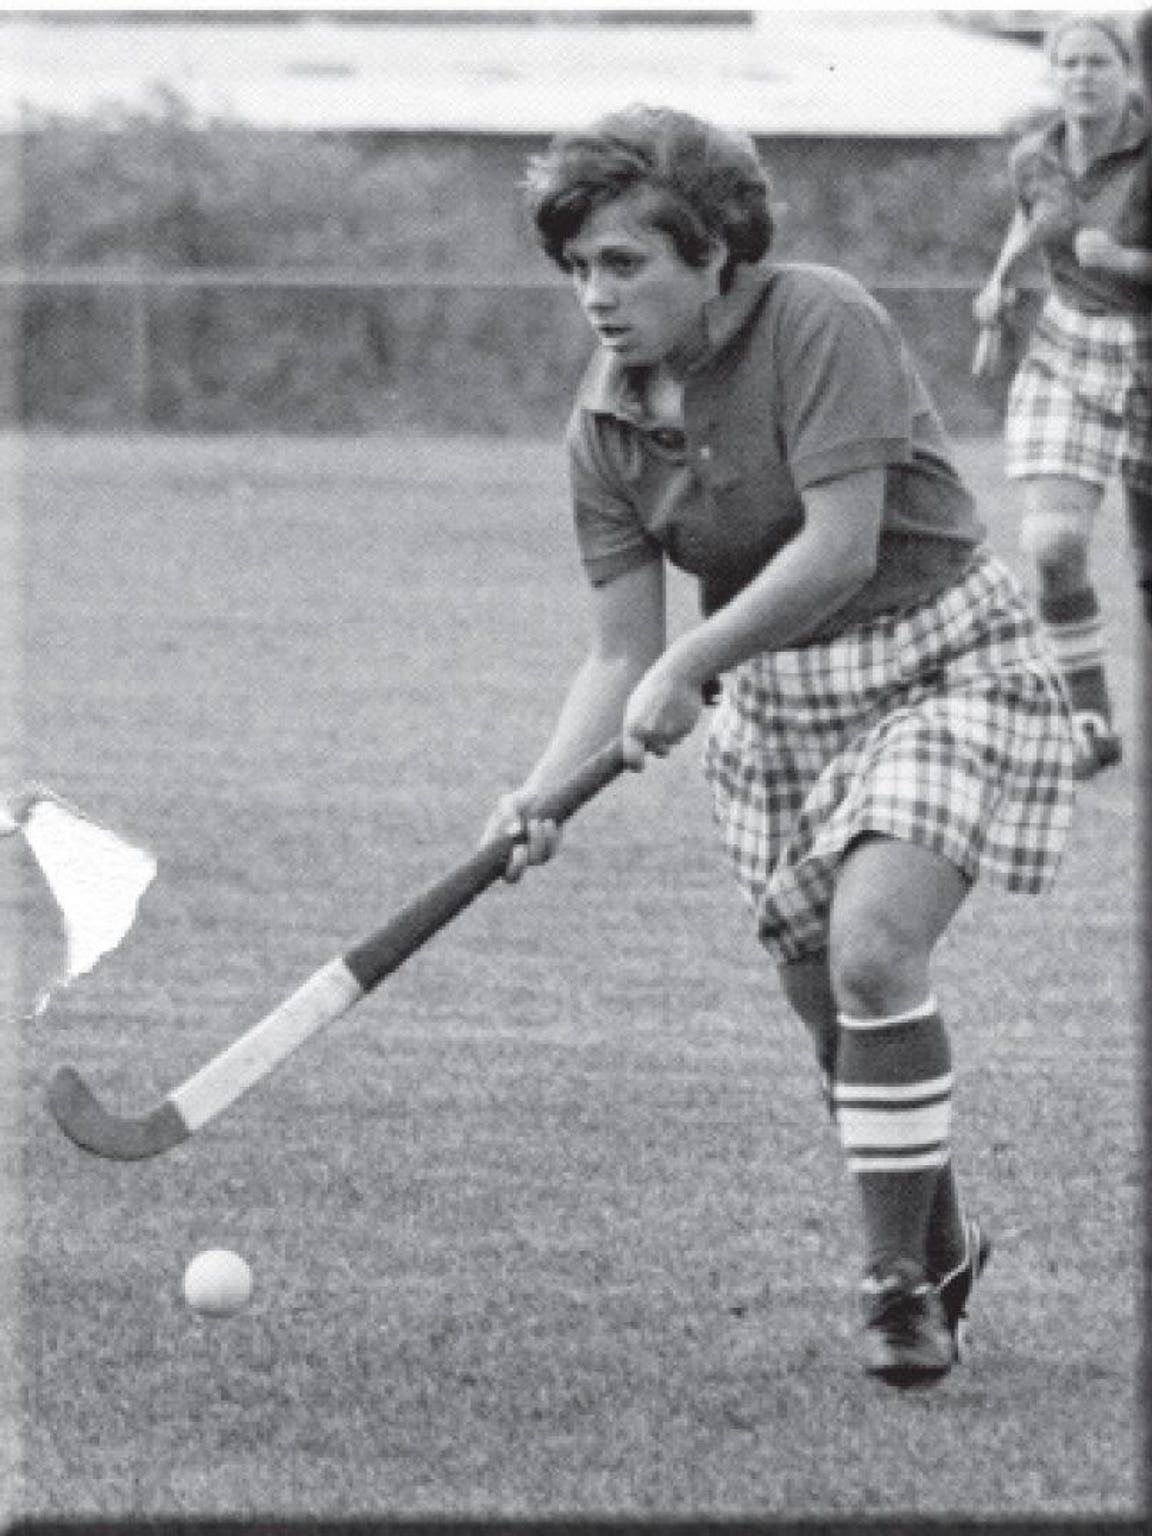 Regina Alonzo played Rutgers field hockey from 1976-79,